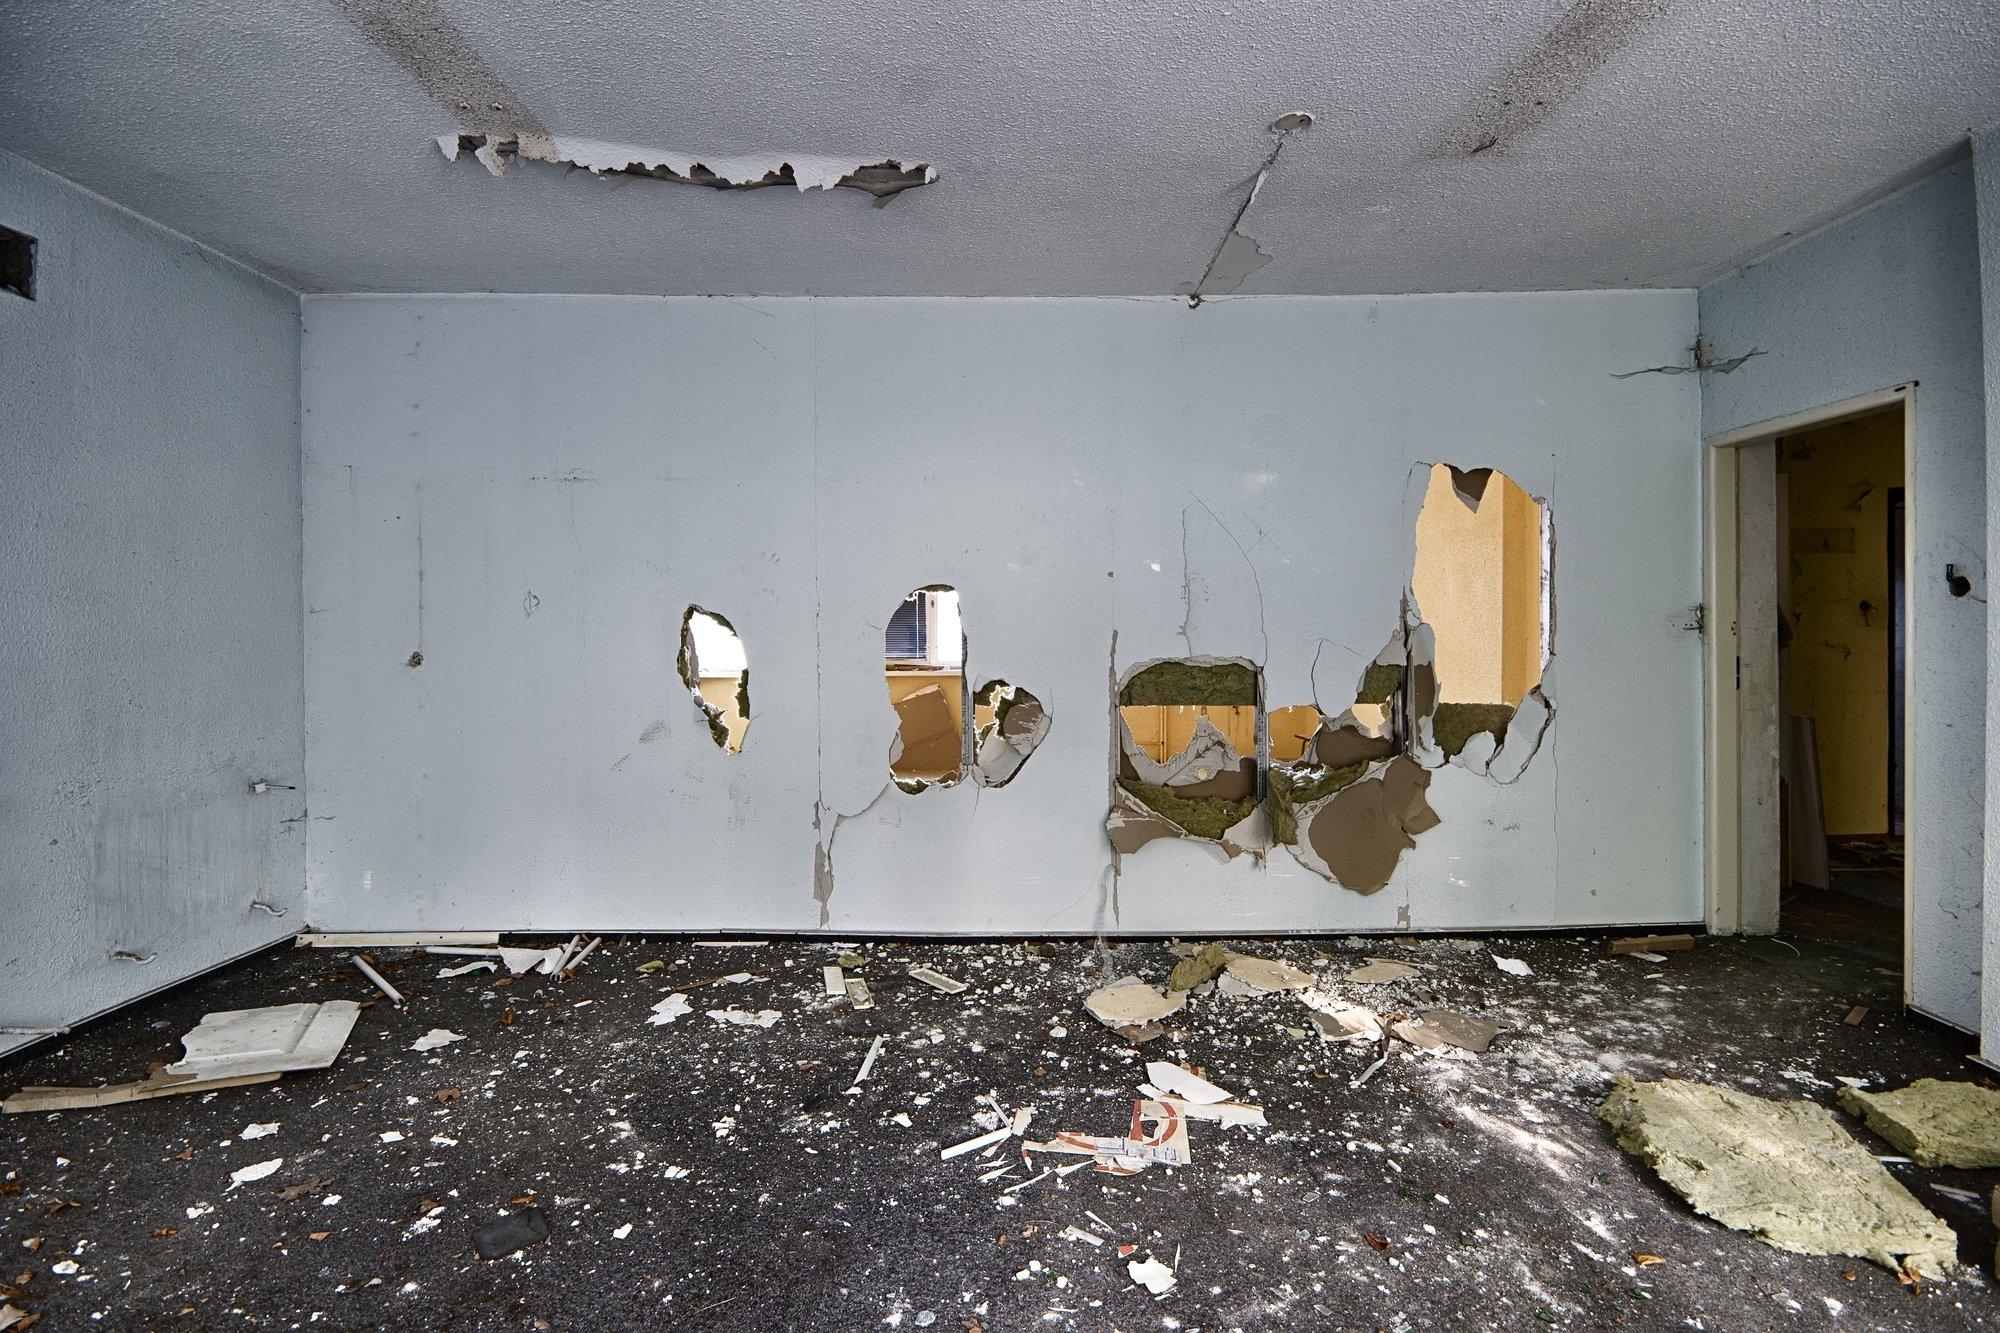 The devastated room